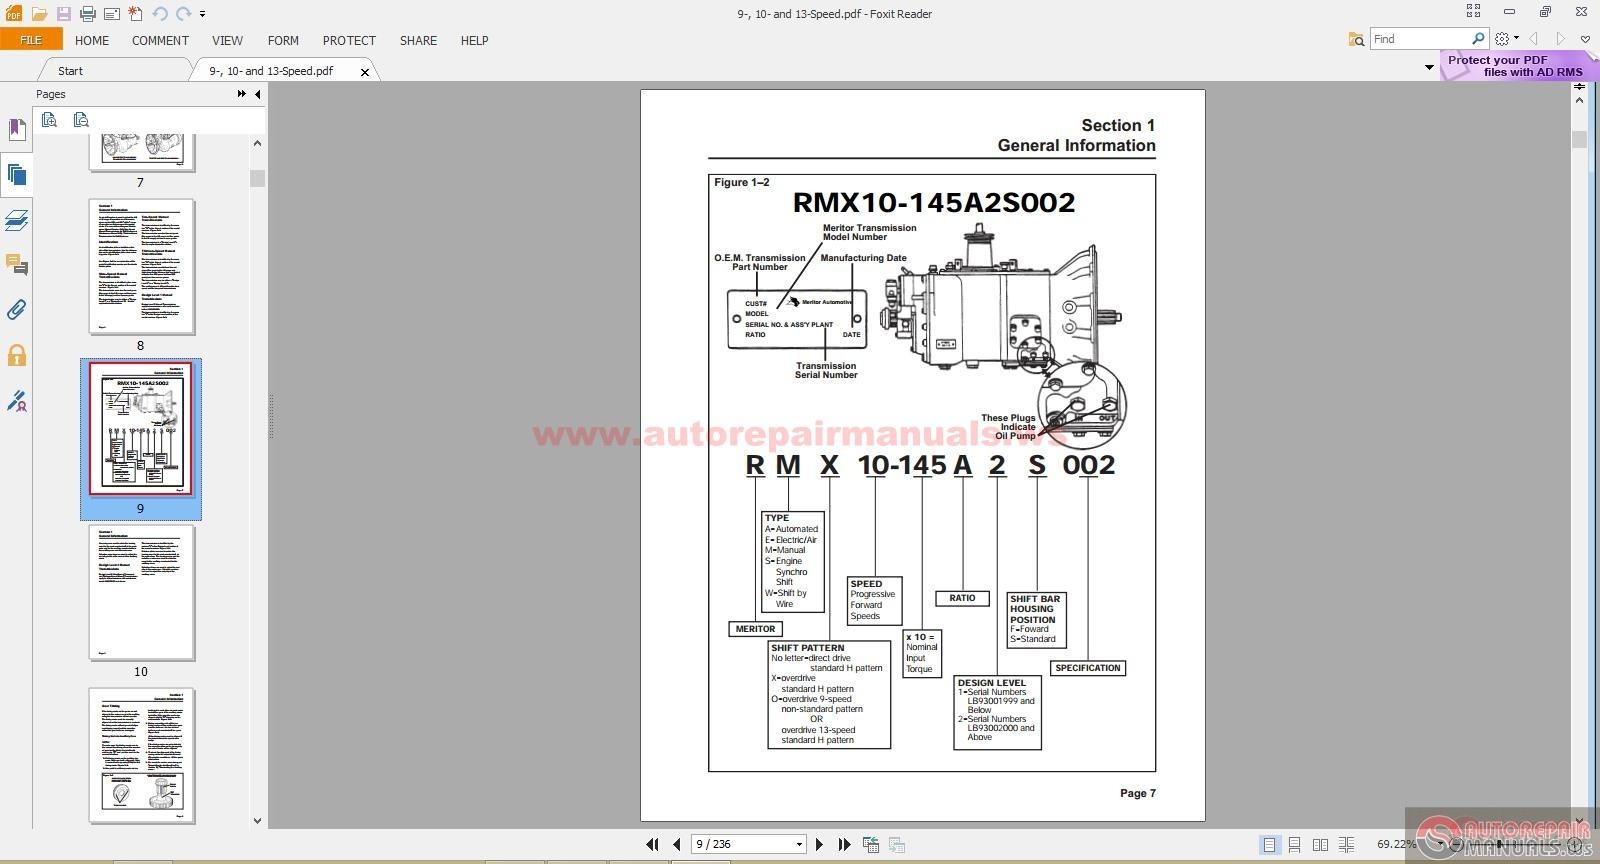 Zf Meritor Transmission Wiring Diagram Schematics Diagrams Haldex Abs House Symbols U2022 Rh Maxturner Co Wabco Trailer